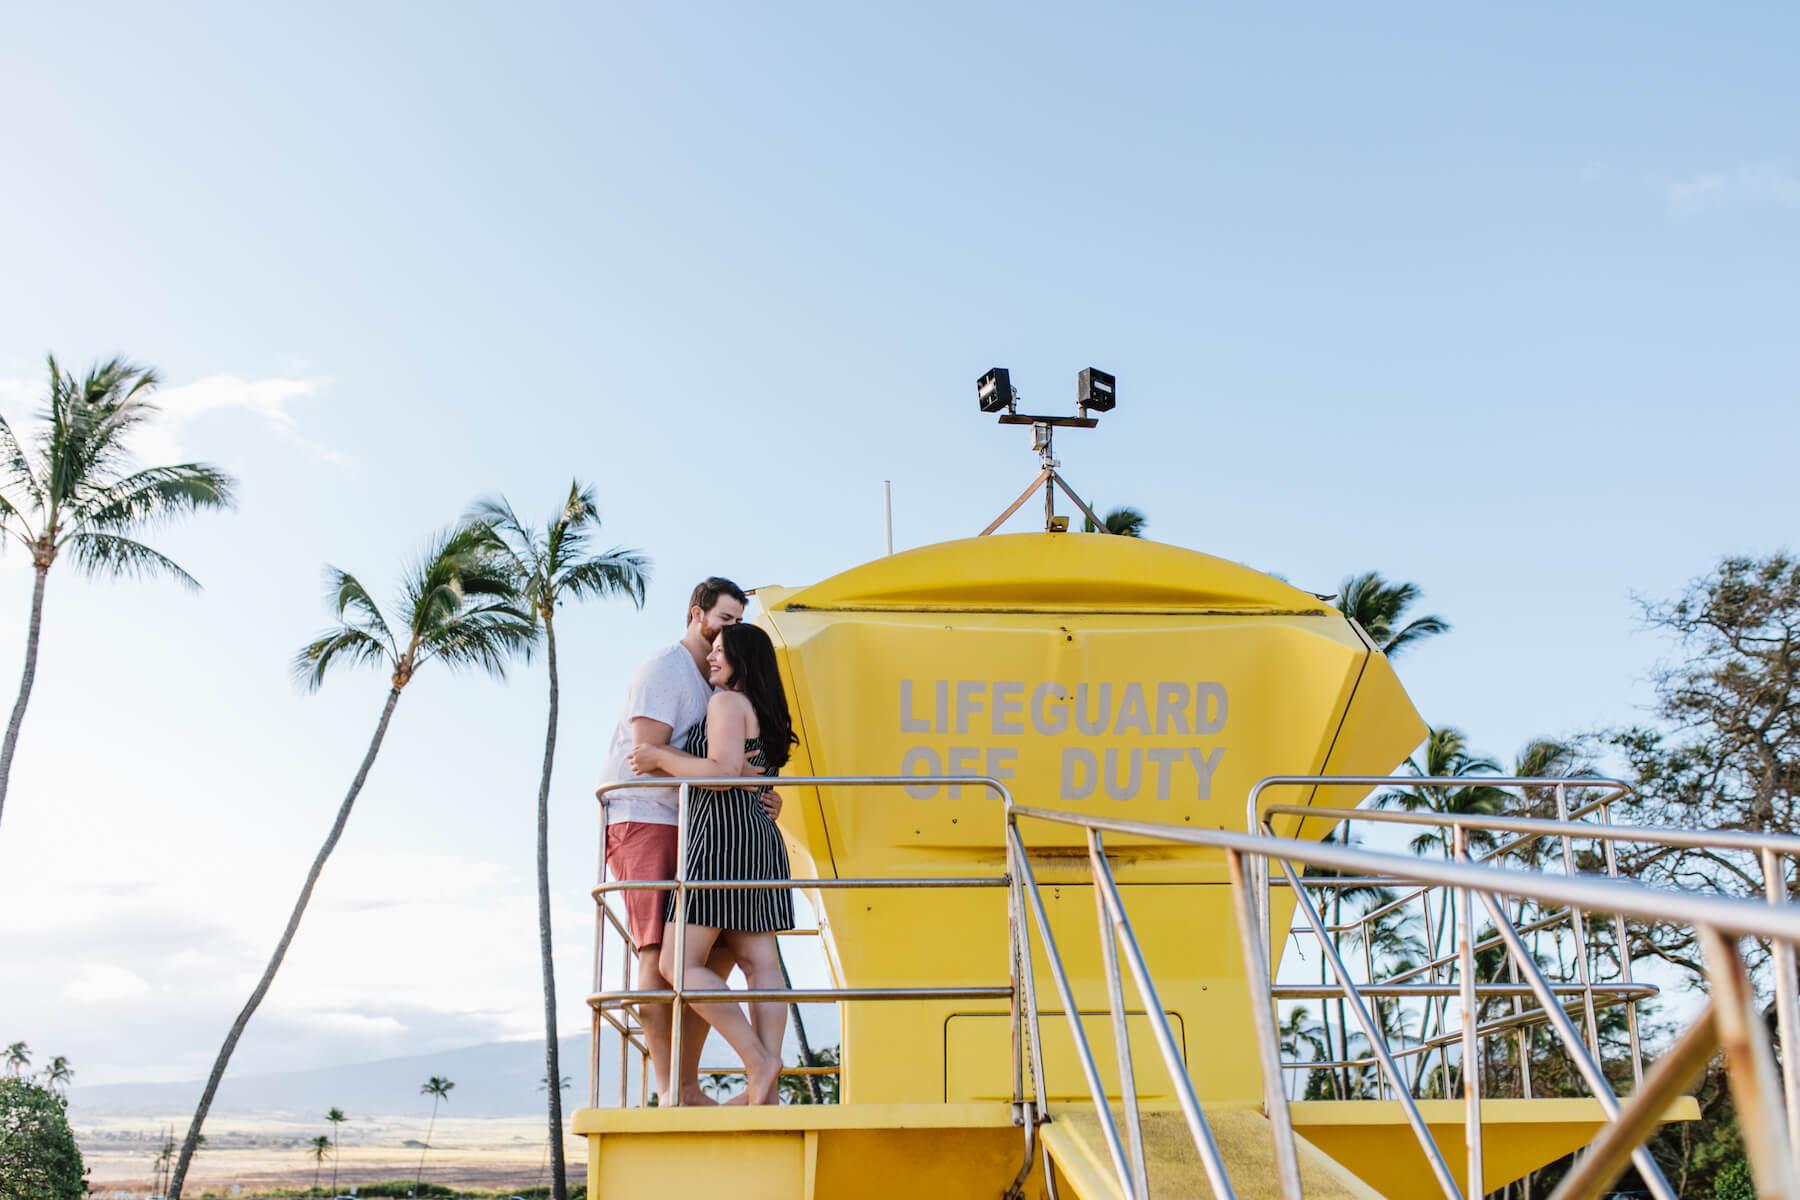 maui-08-28-2019-honeymoon-3_original